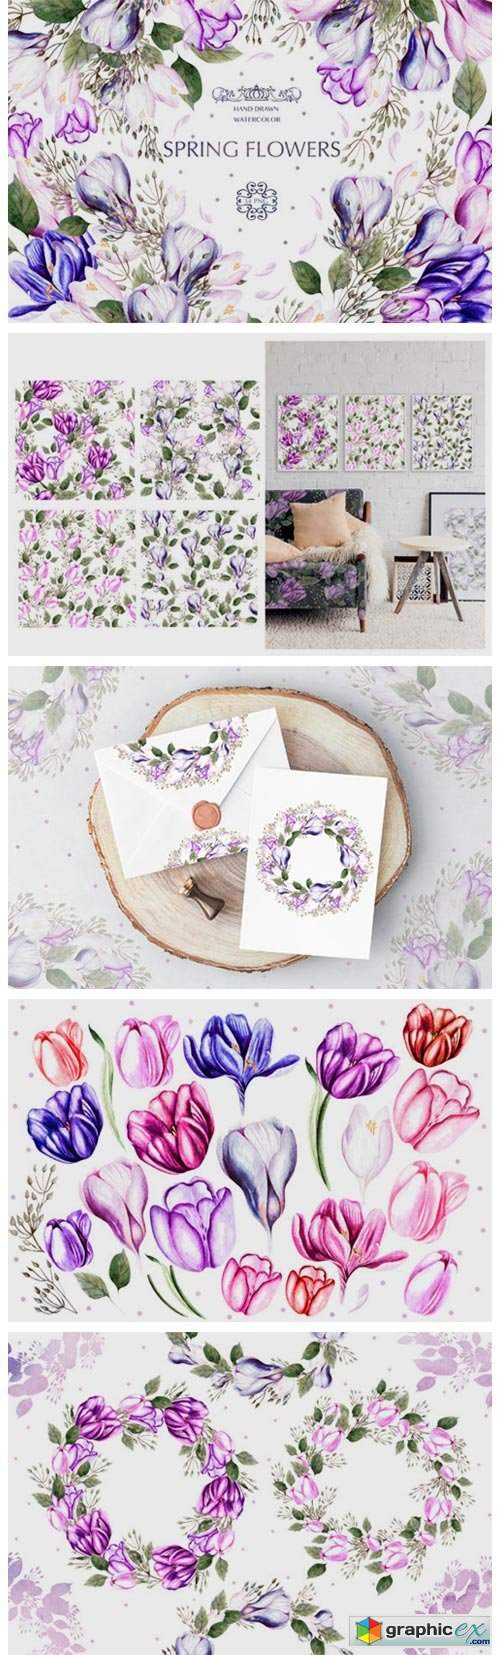 Watercolor Spring Tulips & Crocus